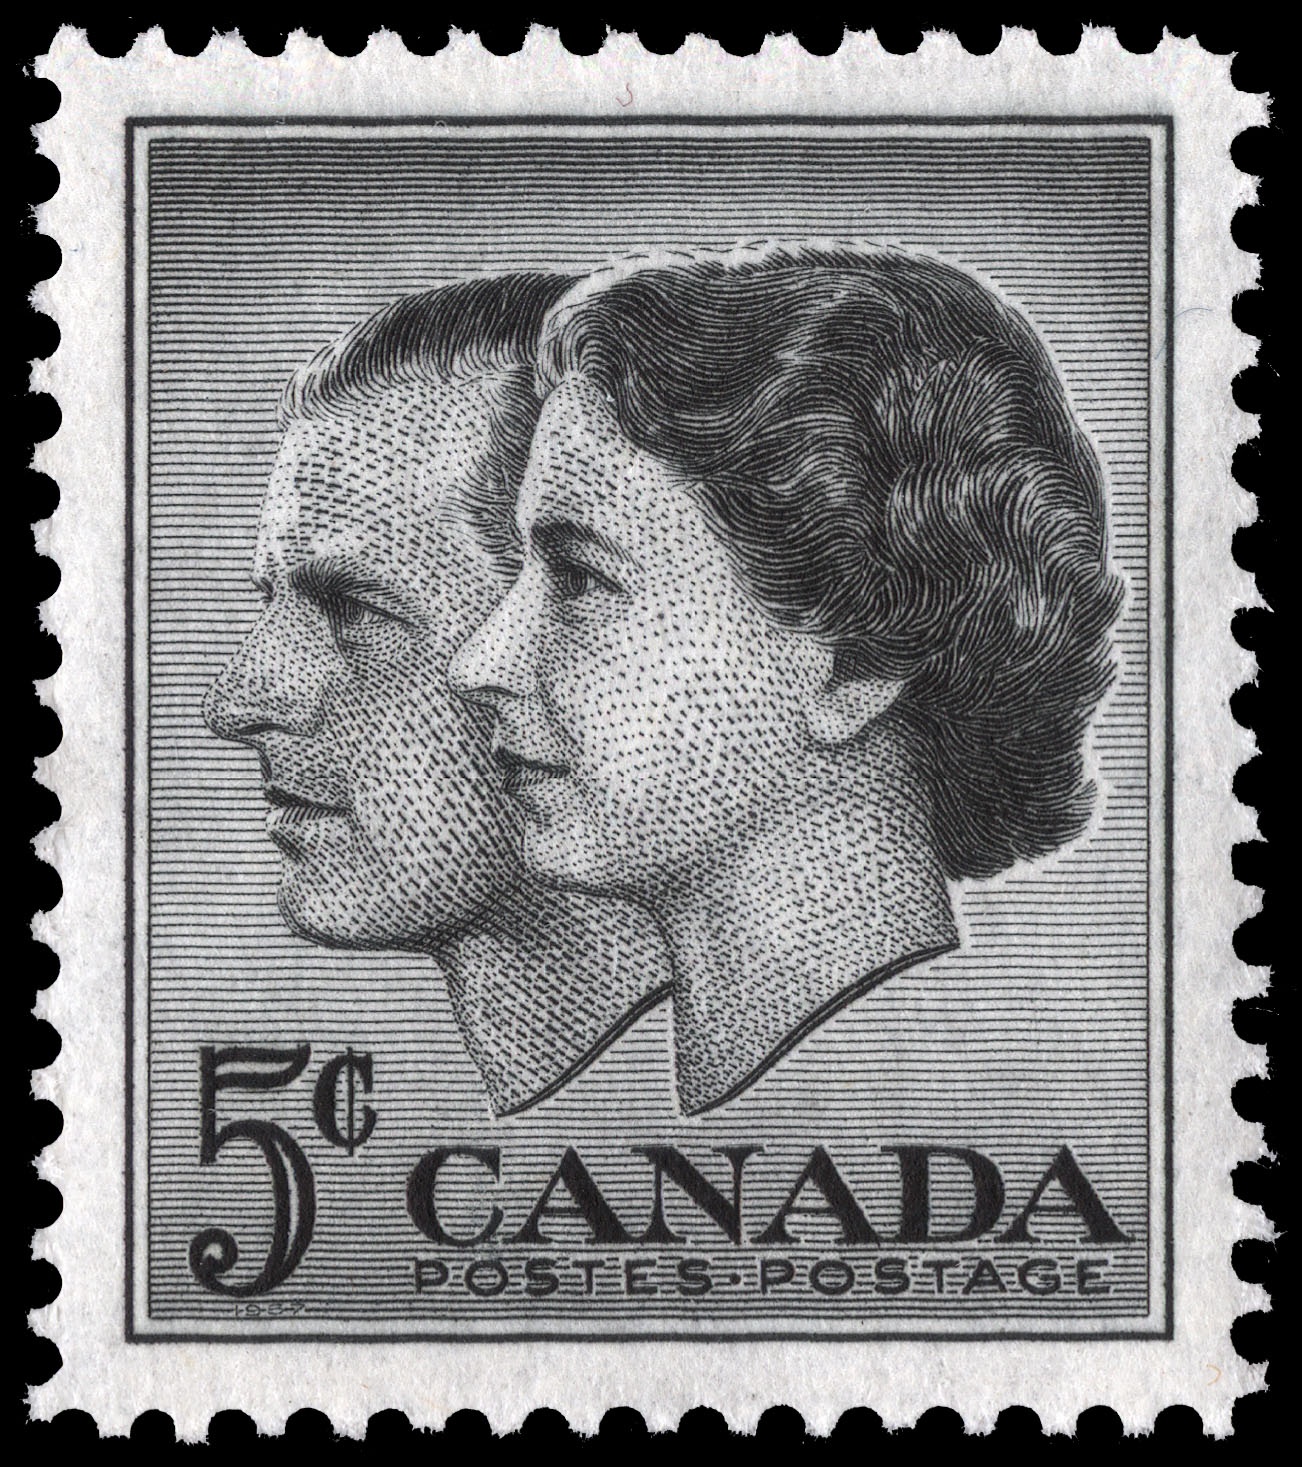 Queen Elizabeth II & Prince Philip Canada Postage Stamp